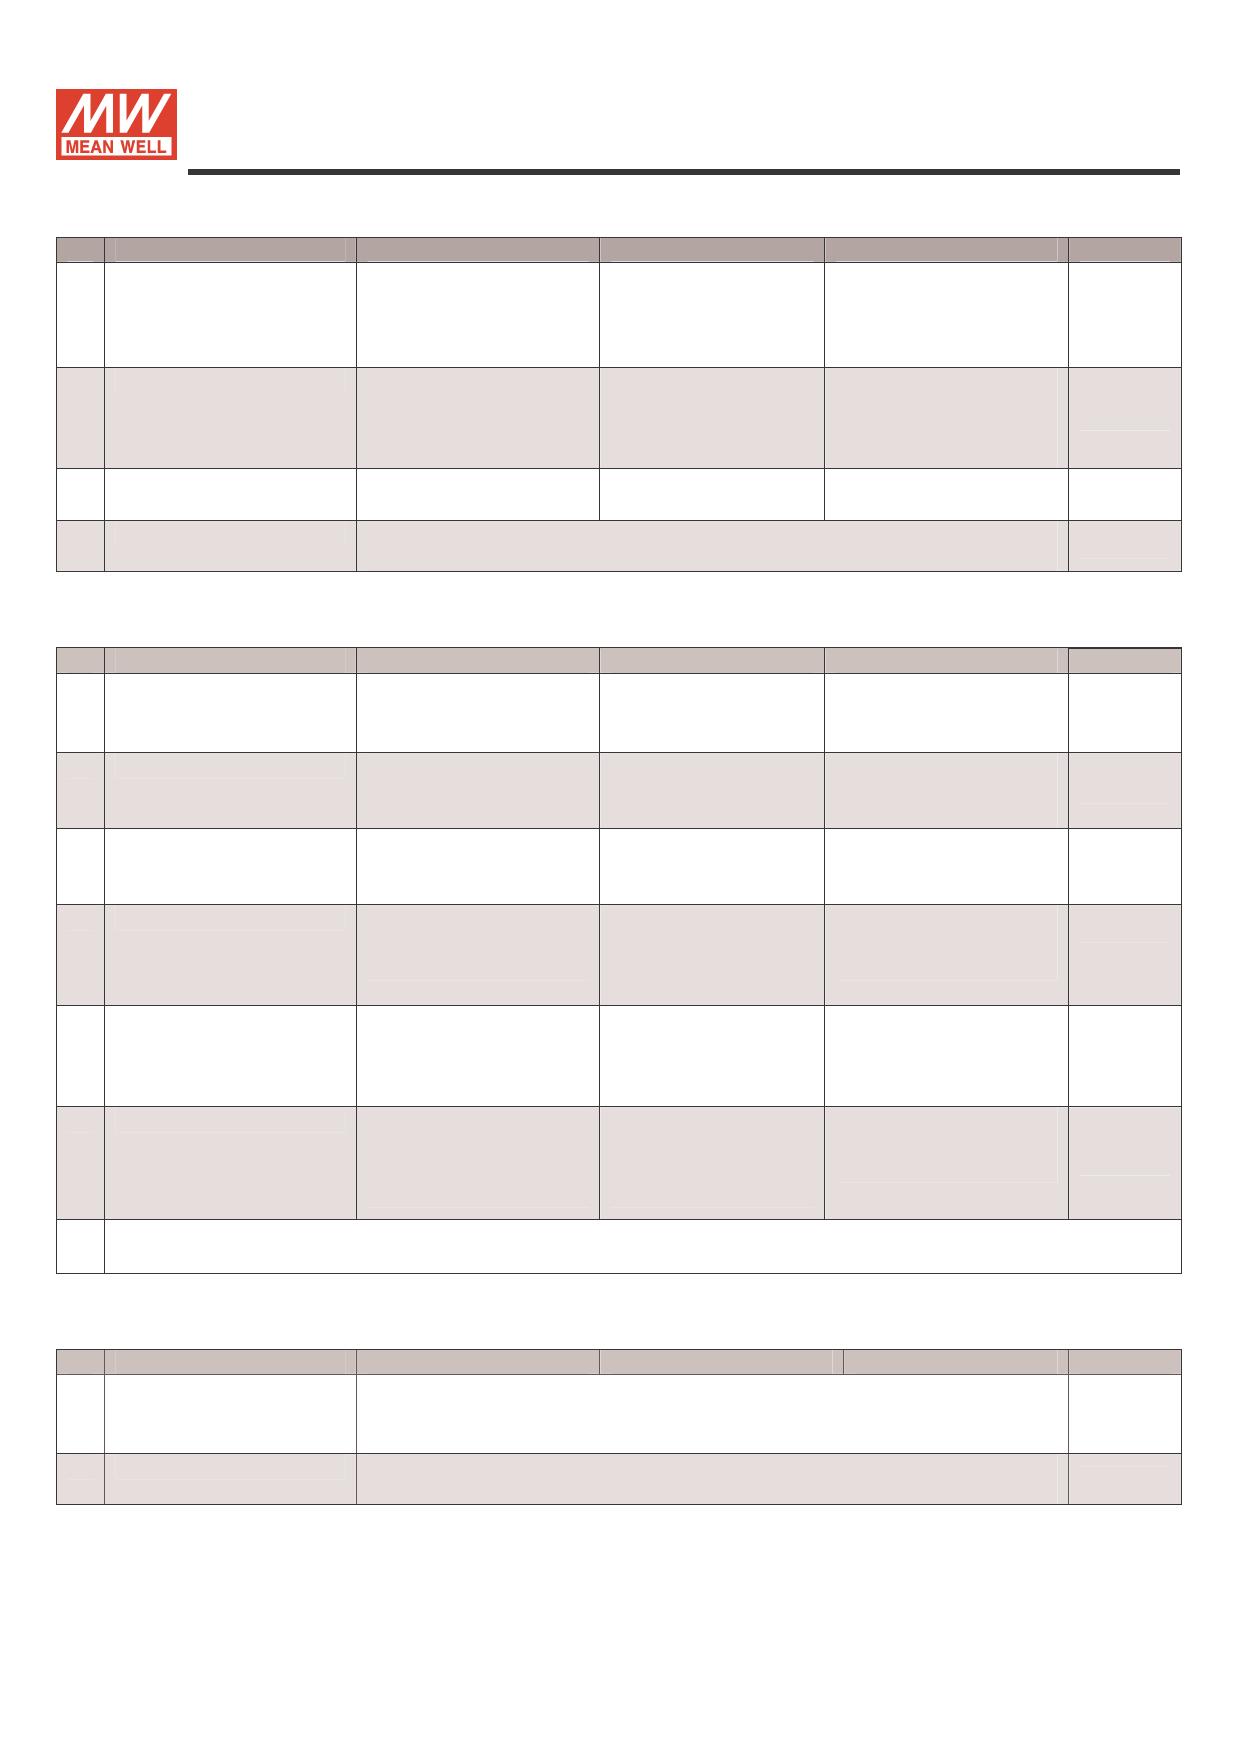 RQ-50 pdf, 반도체, 판매, 대치품